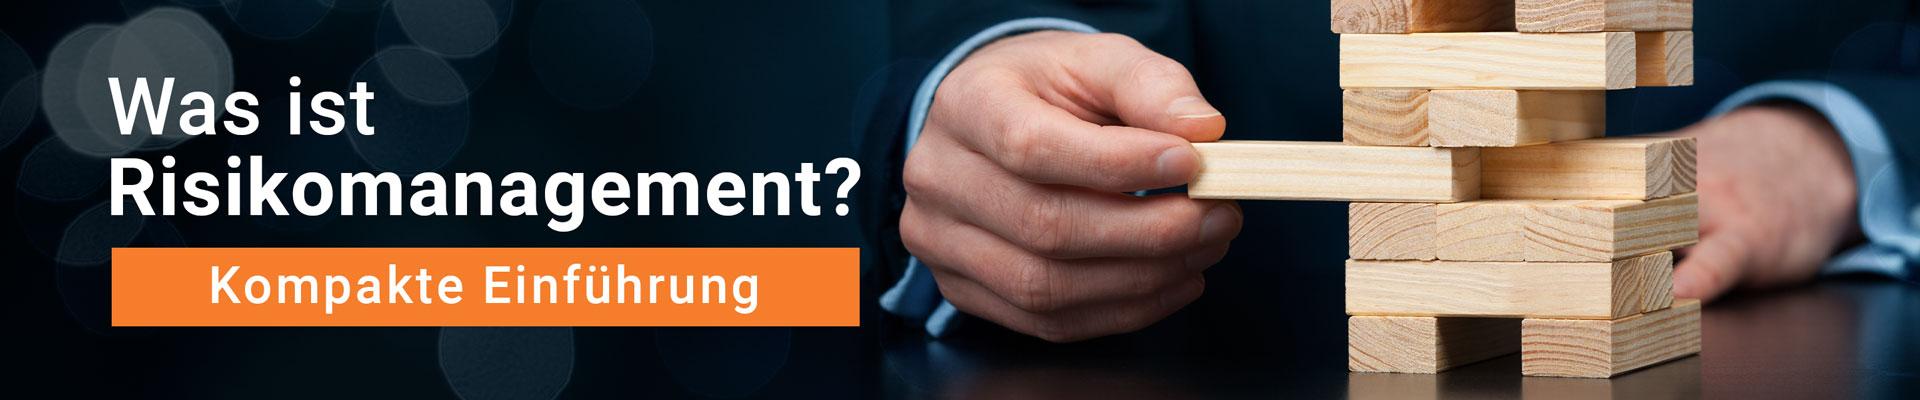 innolytics-risikomanagement-aufbauen-webinar